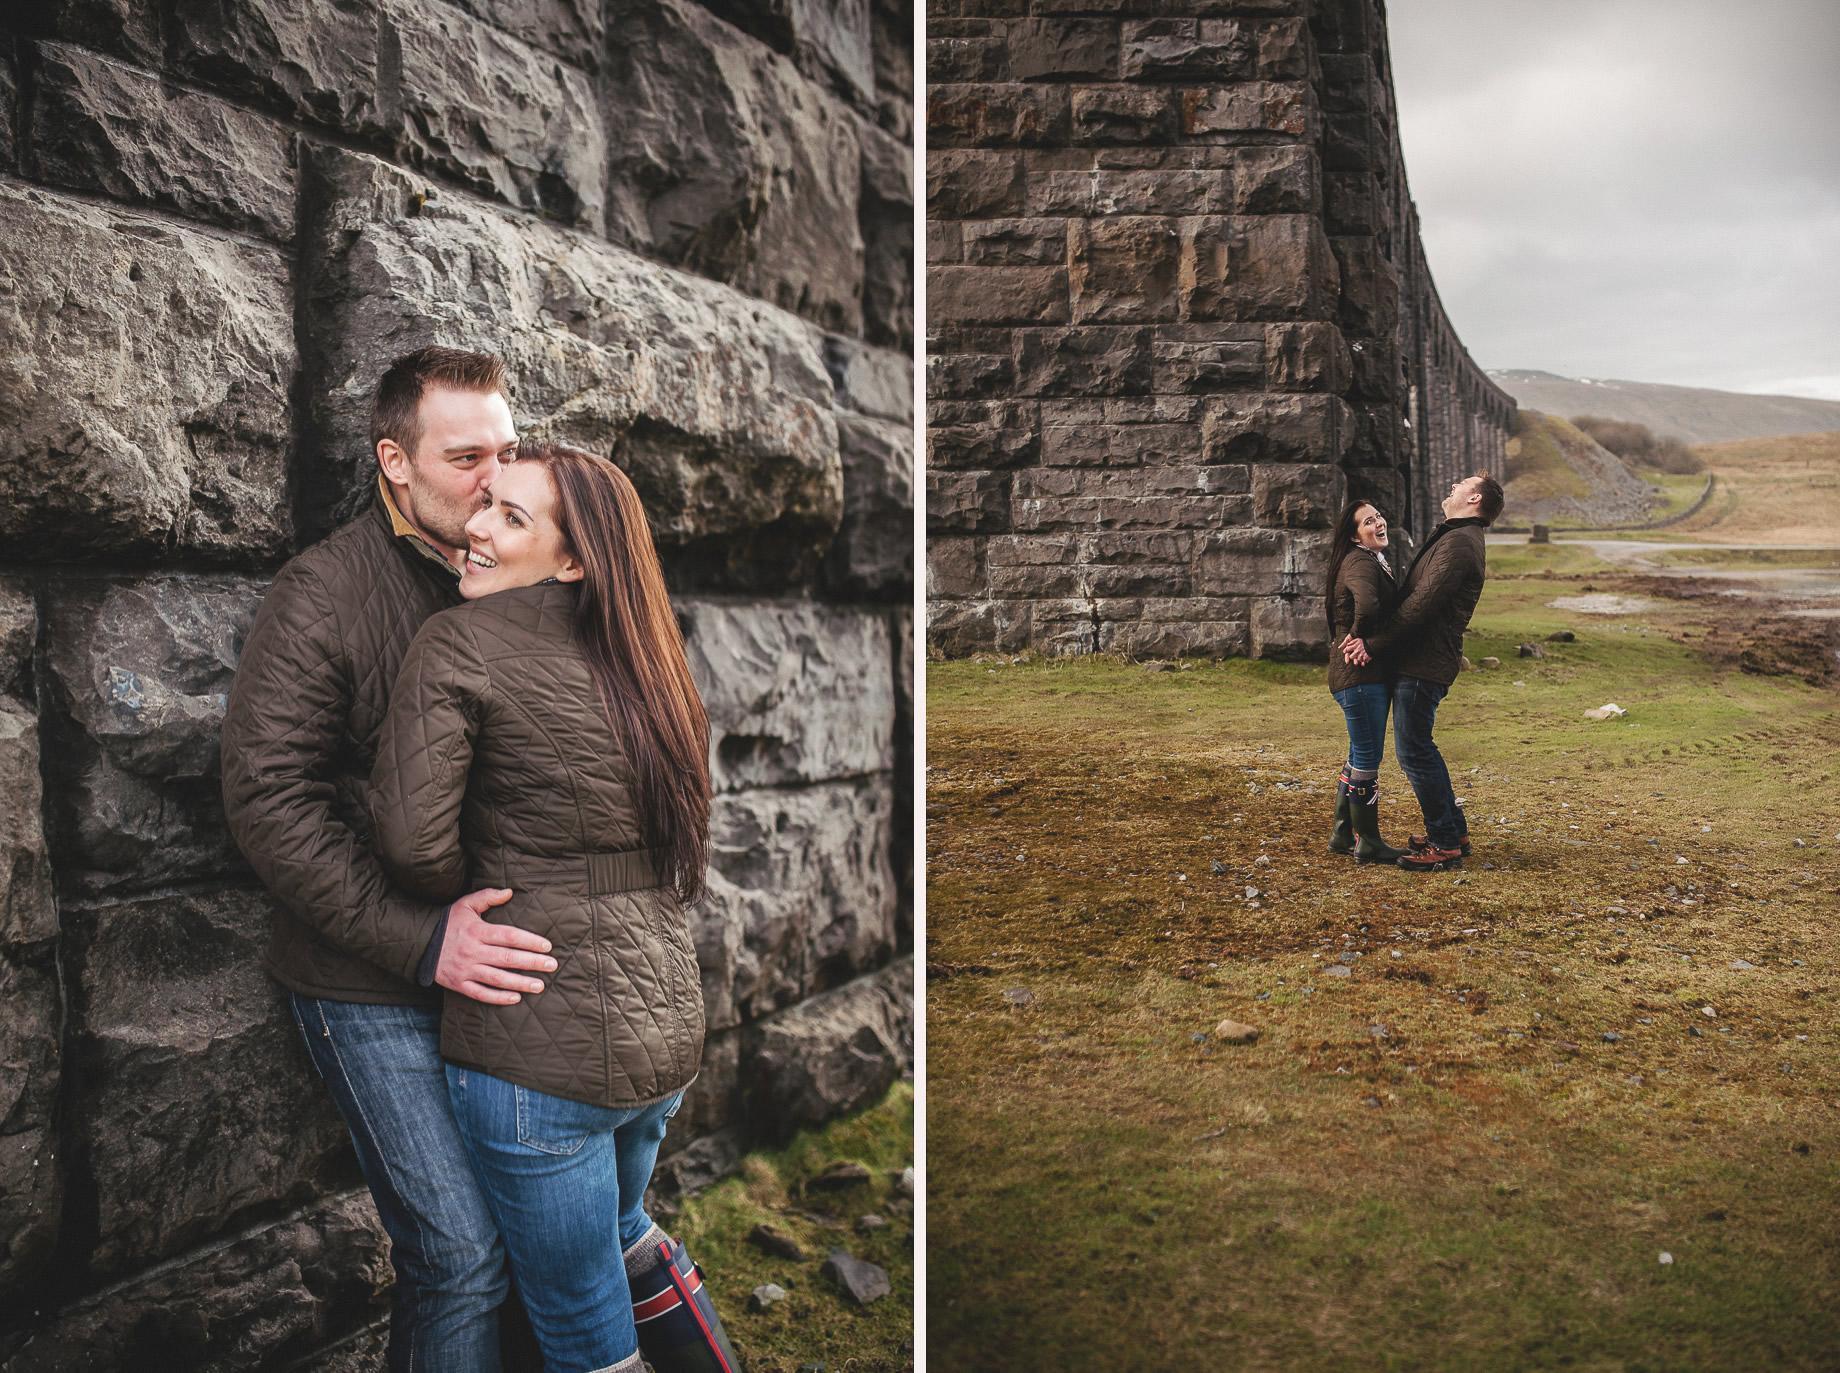 Rachael and Matt's Pre-Wedding Shoot at The Ribblehead Viaduct 026